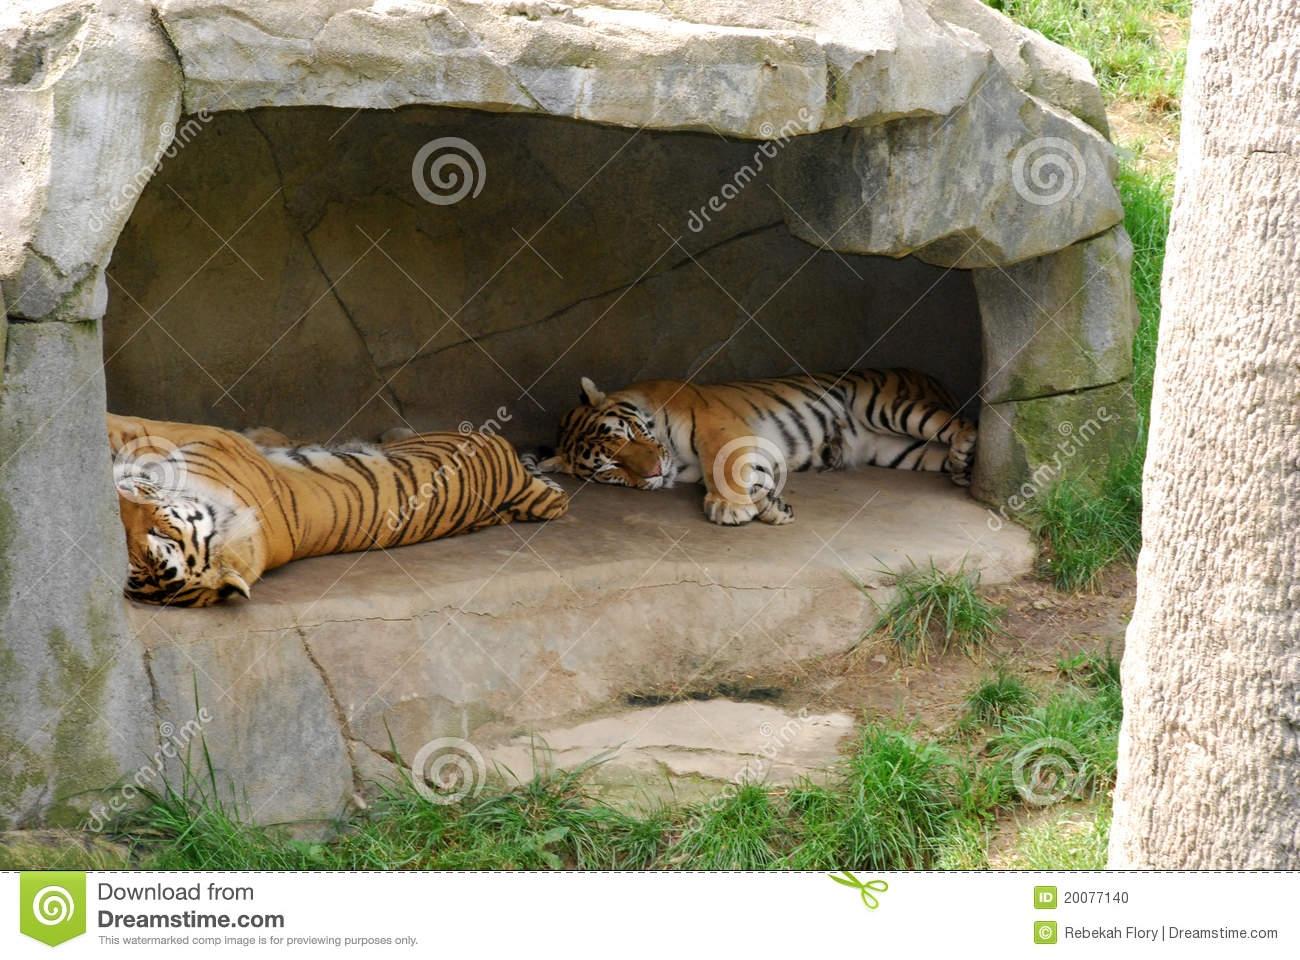 Tiger den clipart.